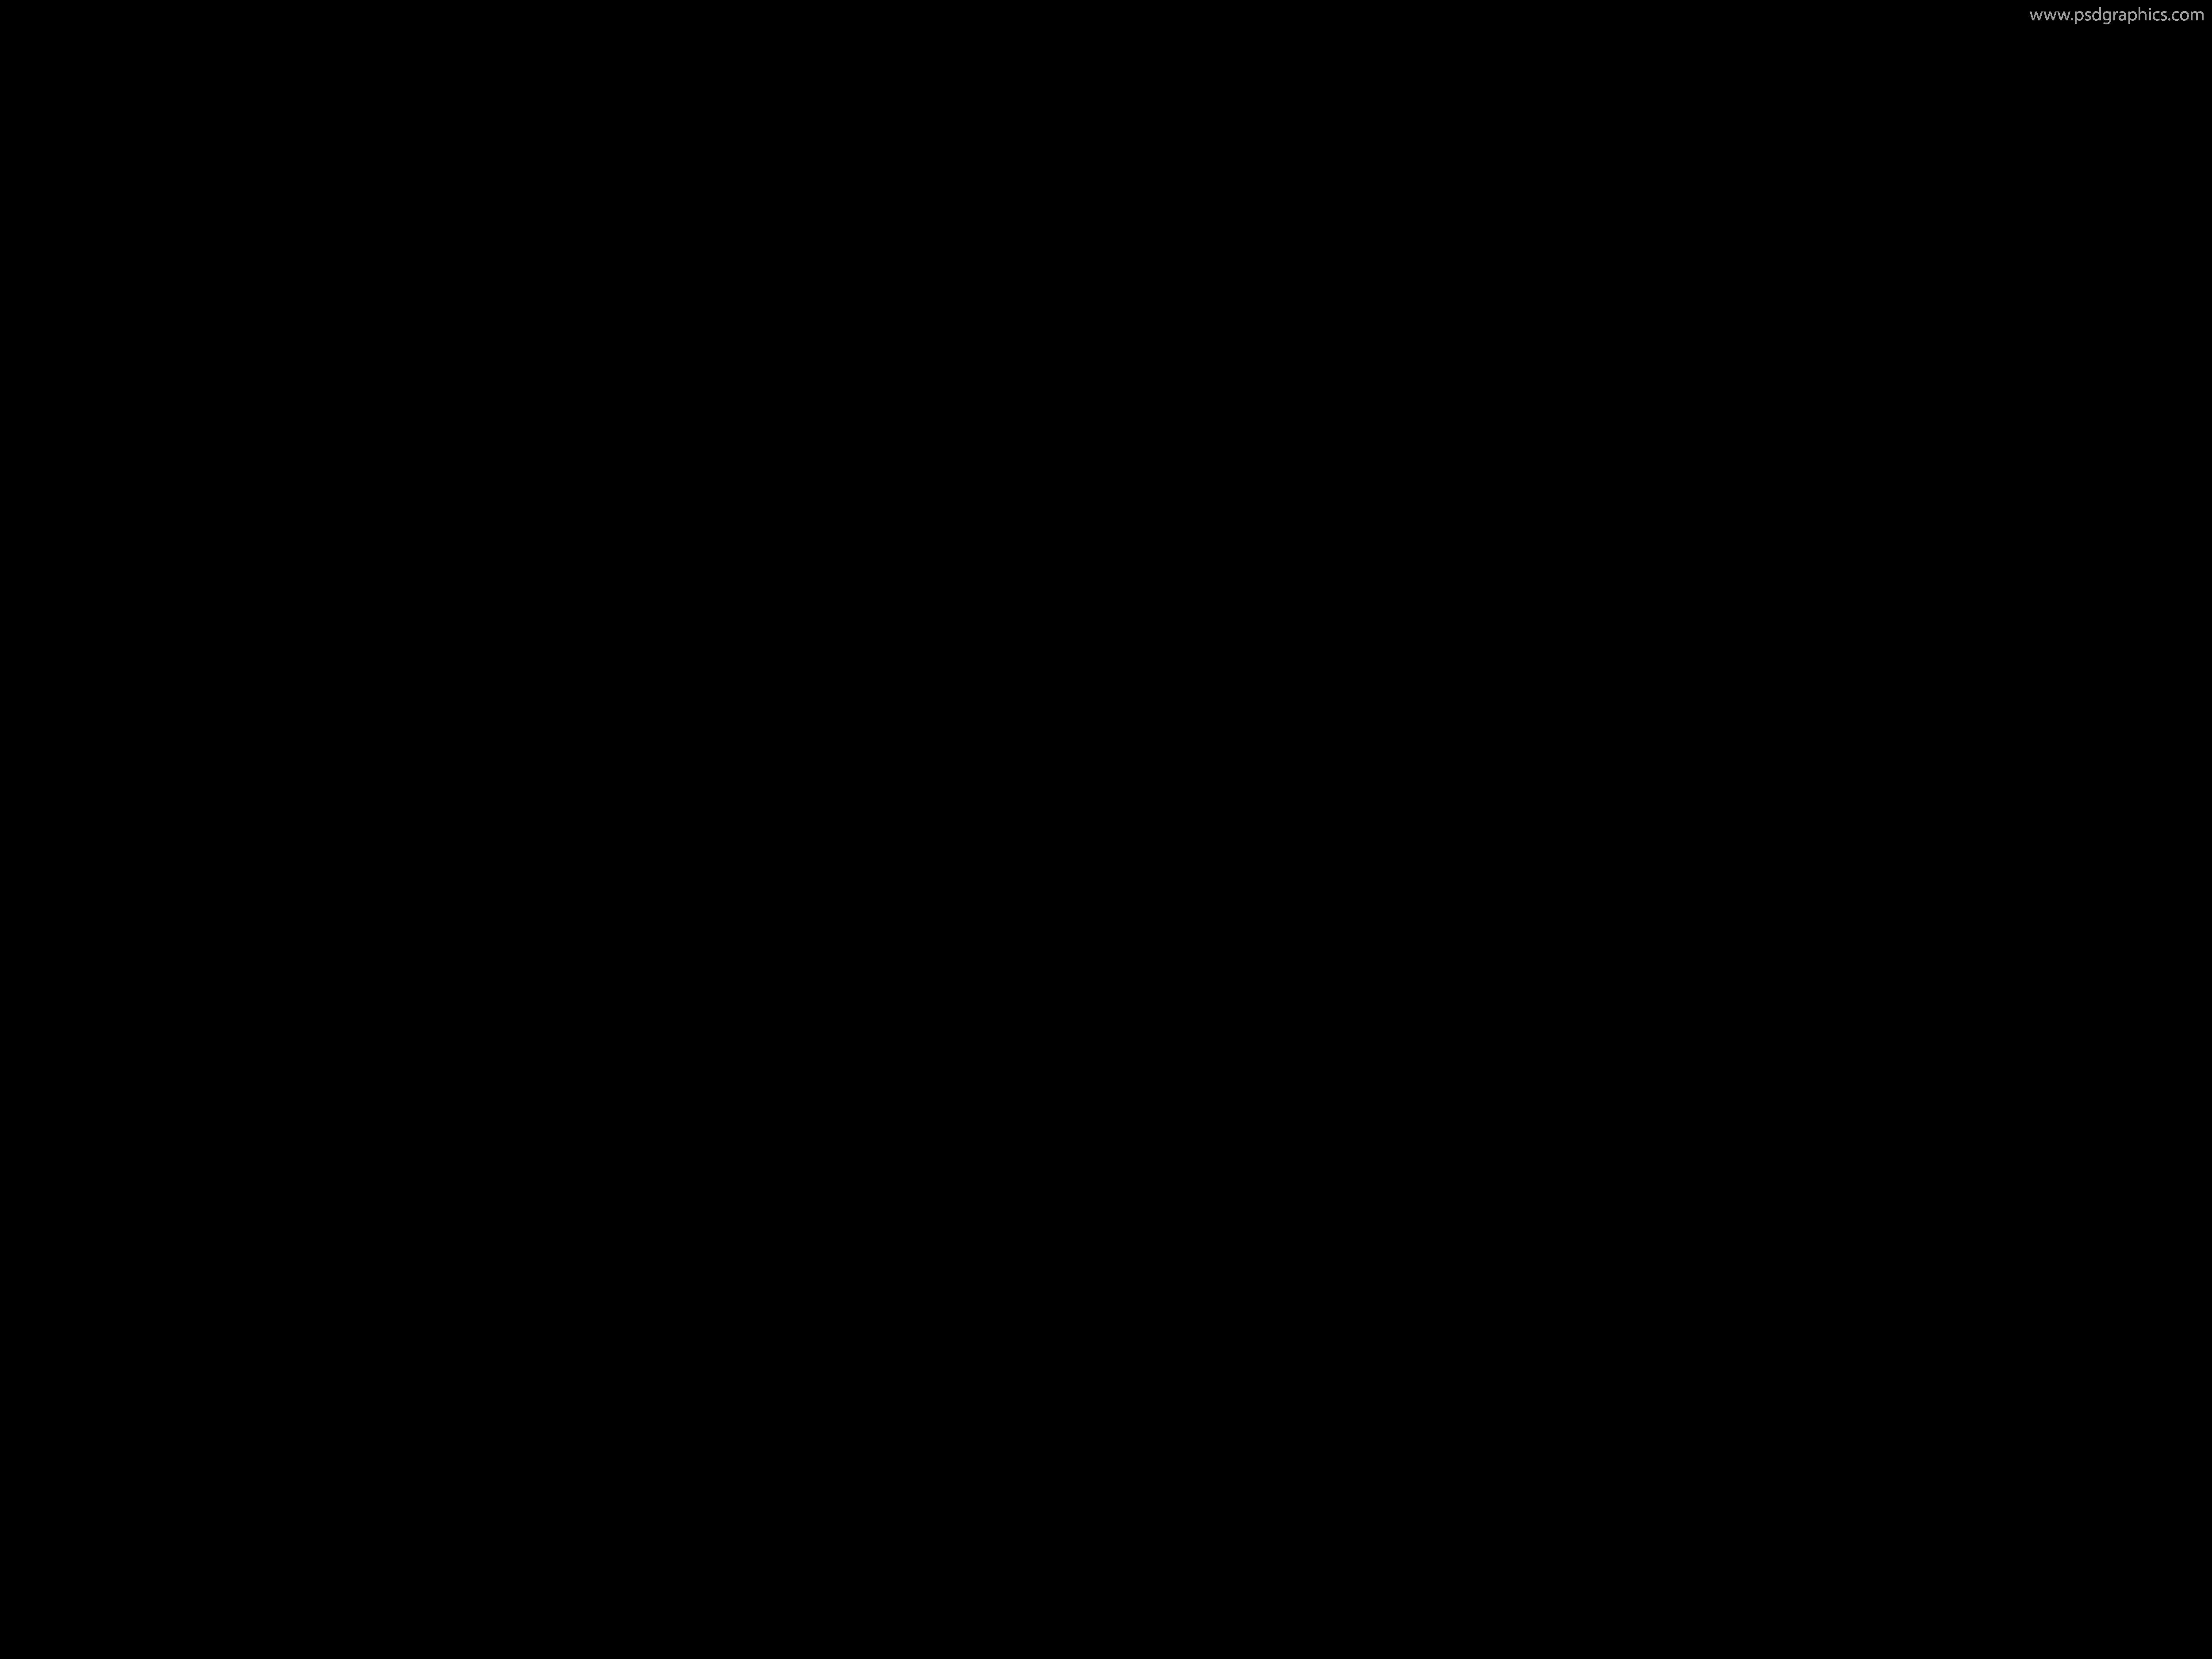 5000x3750 Images Of Black Vector Frames Png